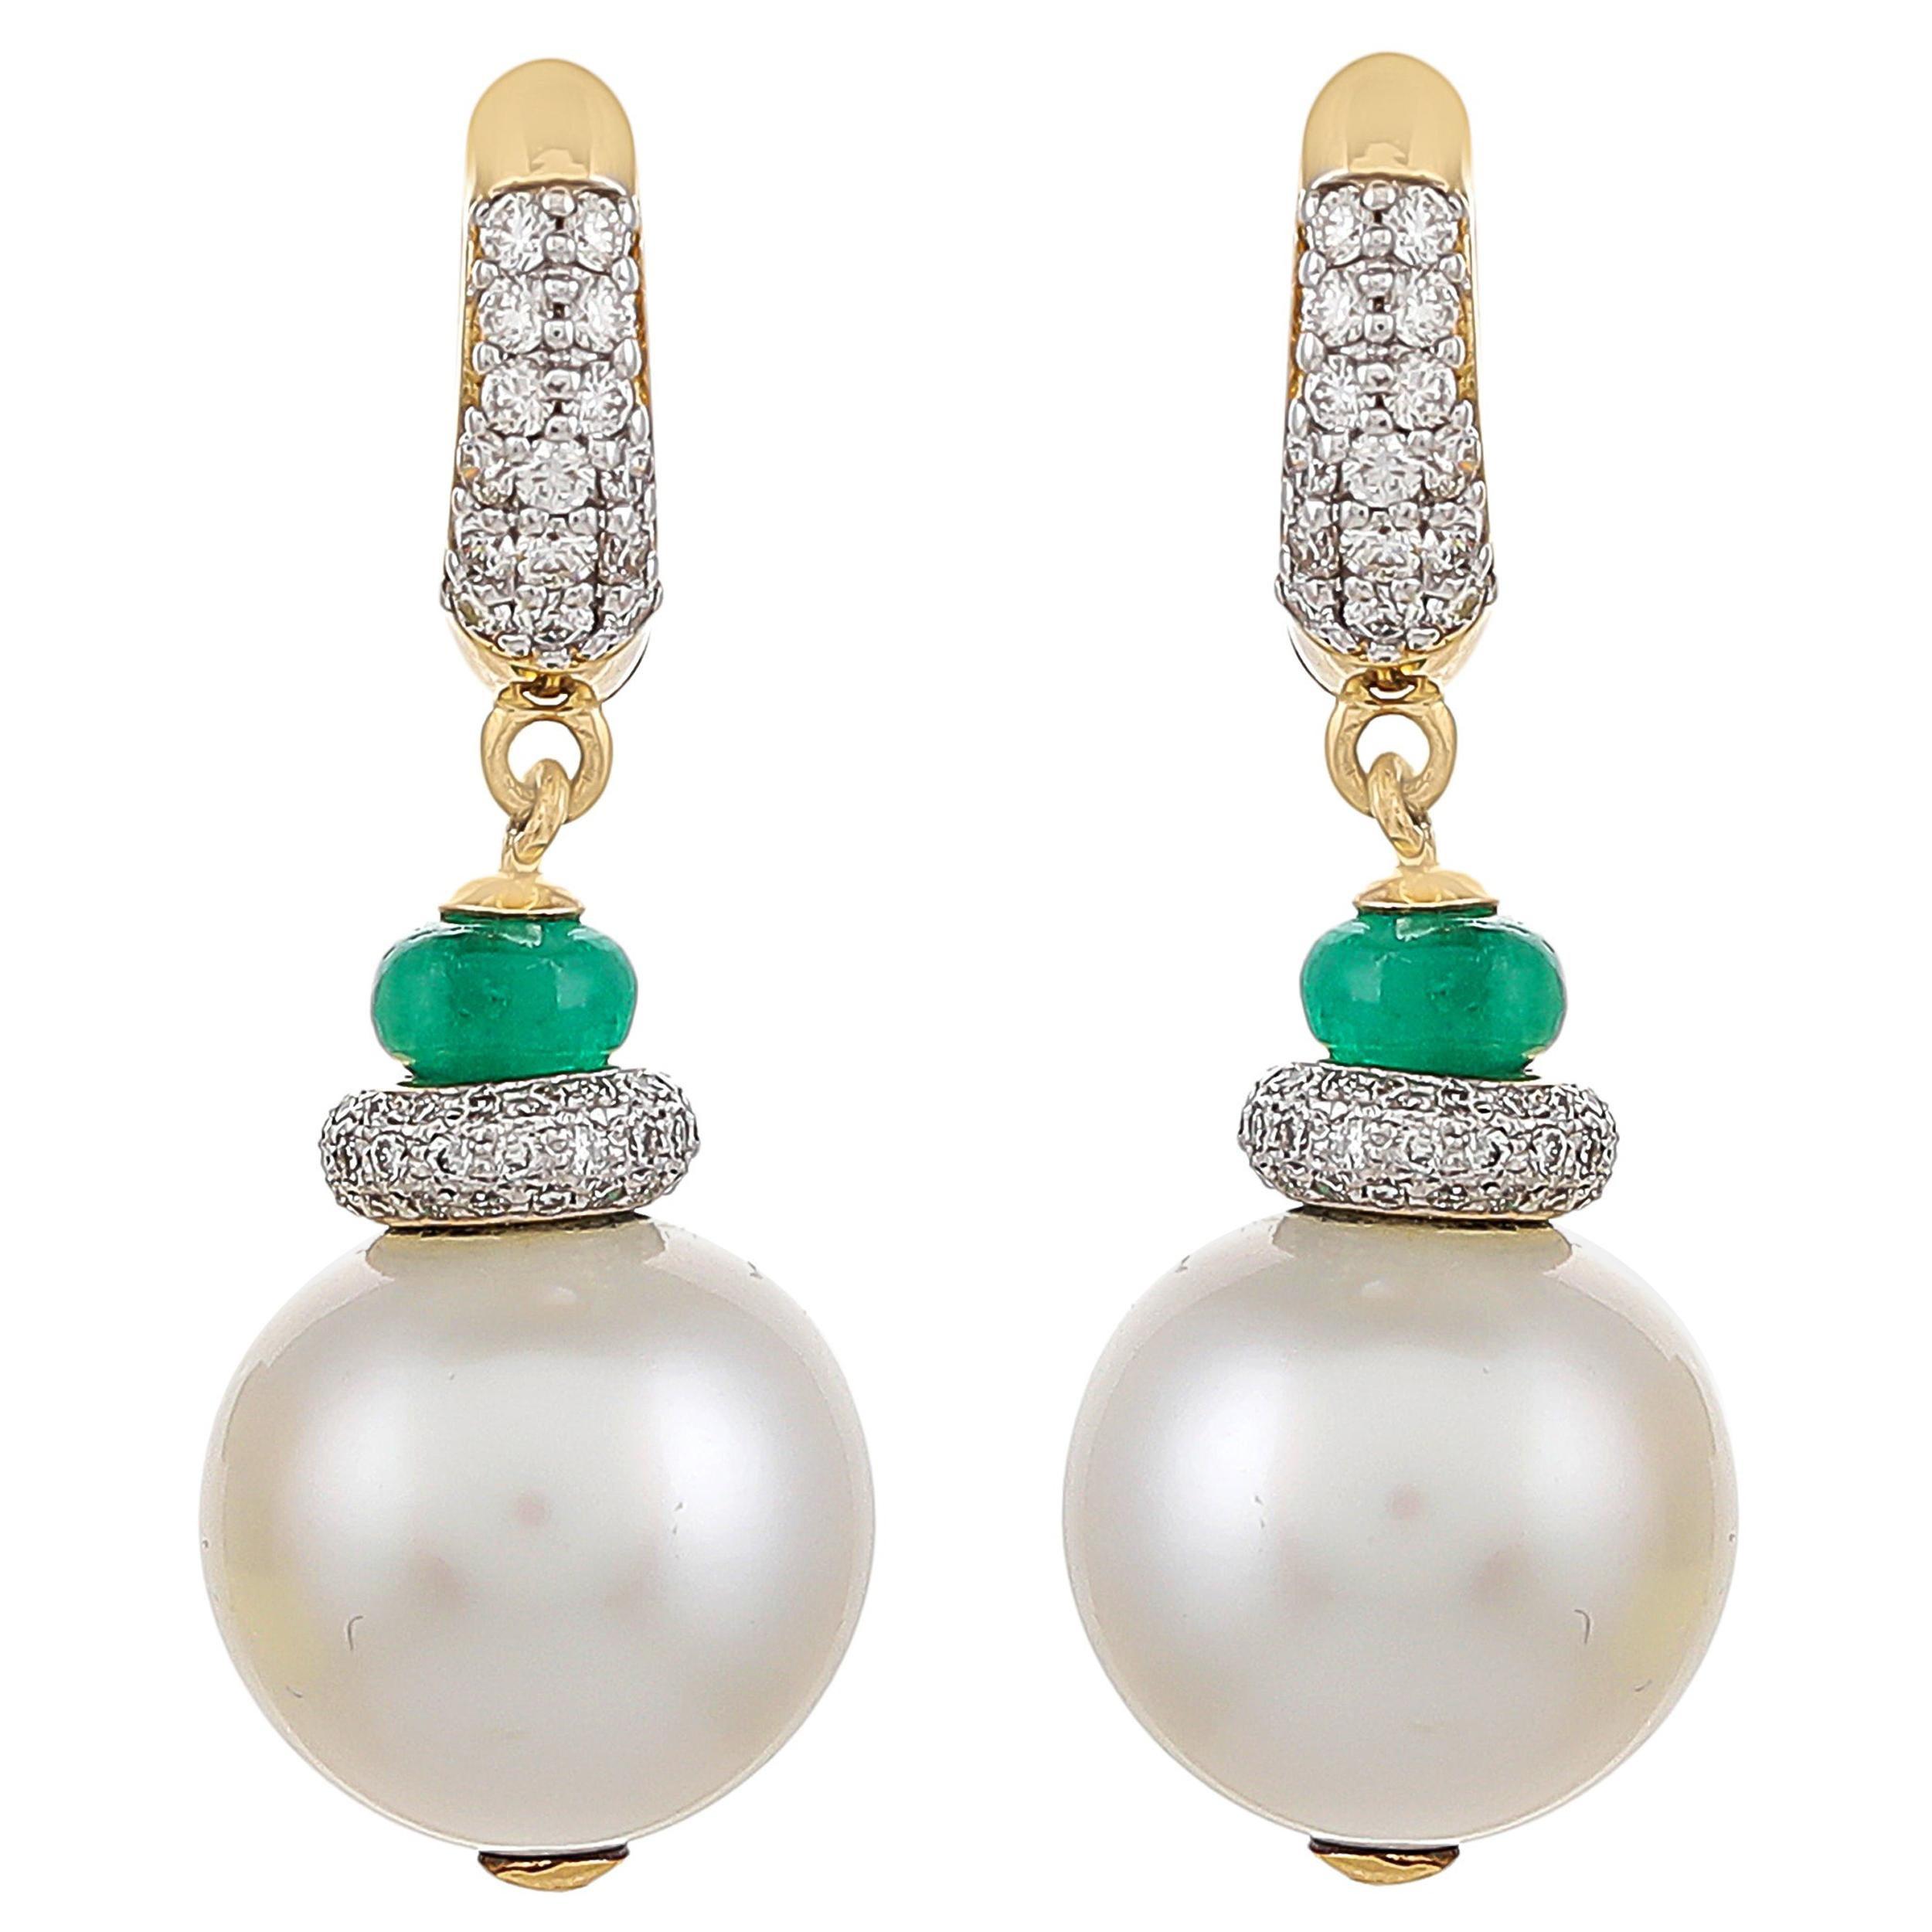 36.60 Carat South Sea Pearl Zambian Emerald and Diamond 18kt Yellow Gold Earring